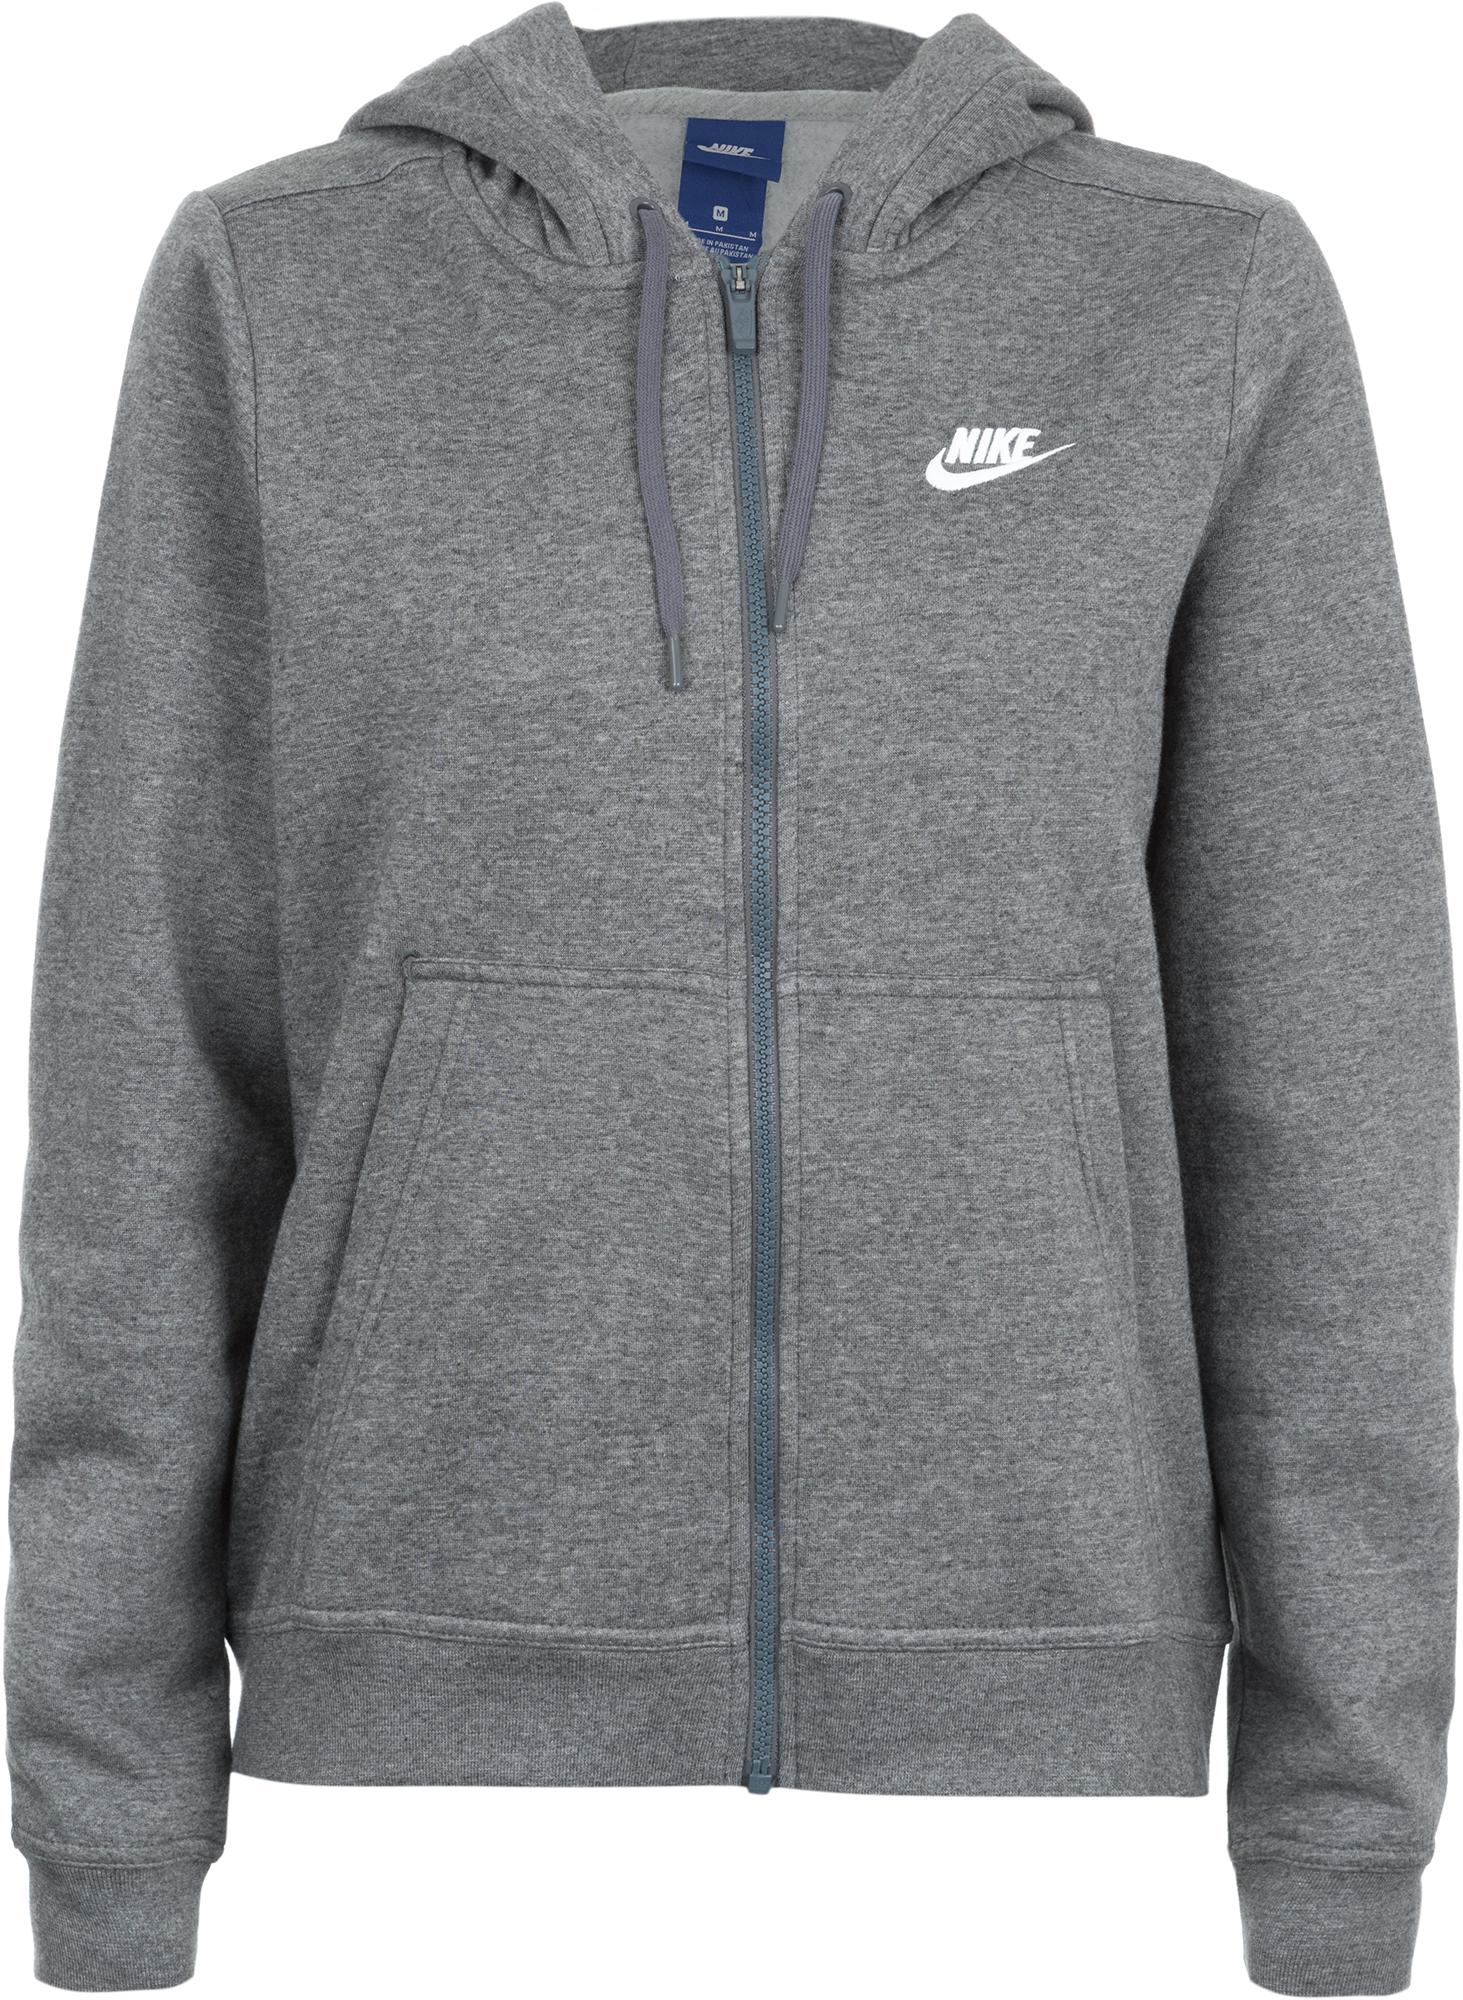 Nike Джемпер женский Nike Sportswear, размер 48-50 nike бриджи женские nike sportswear vintage размер 48 50